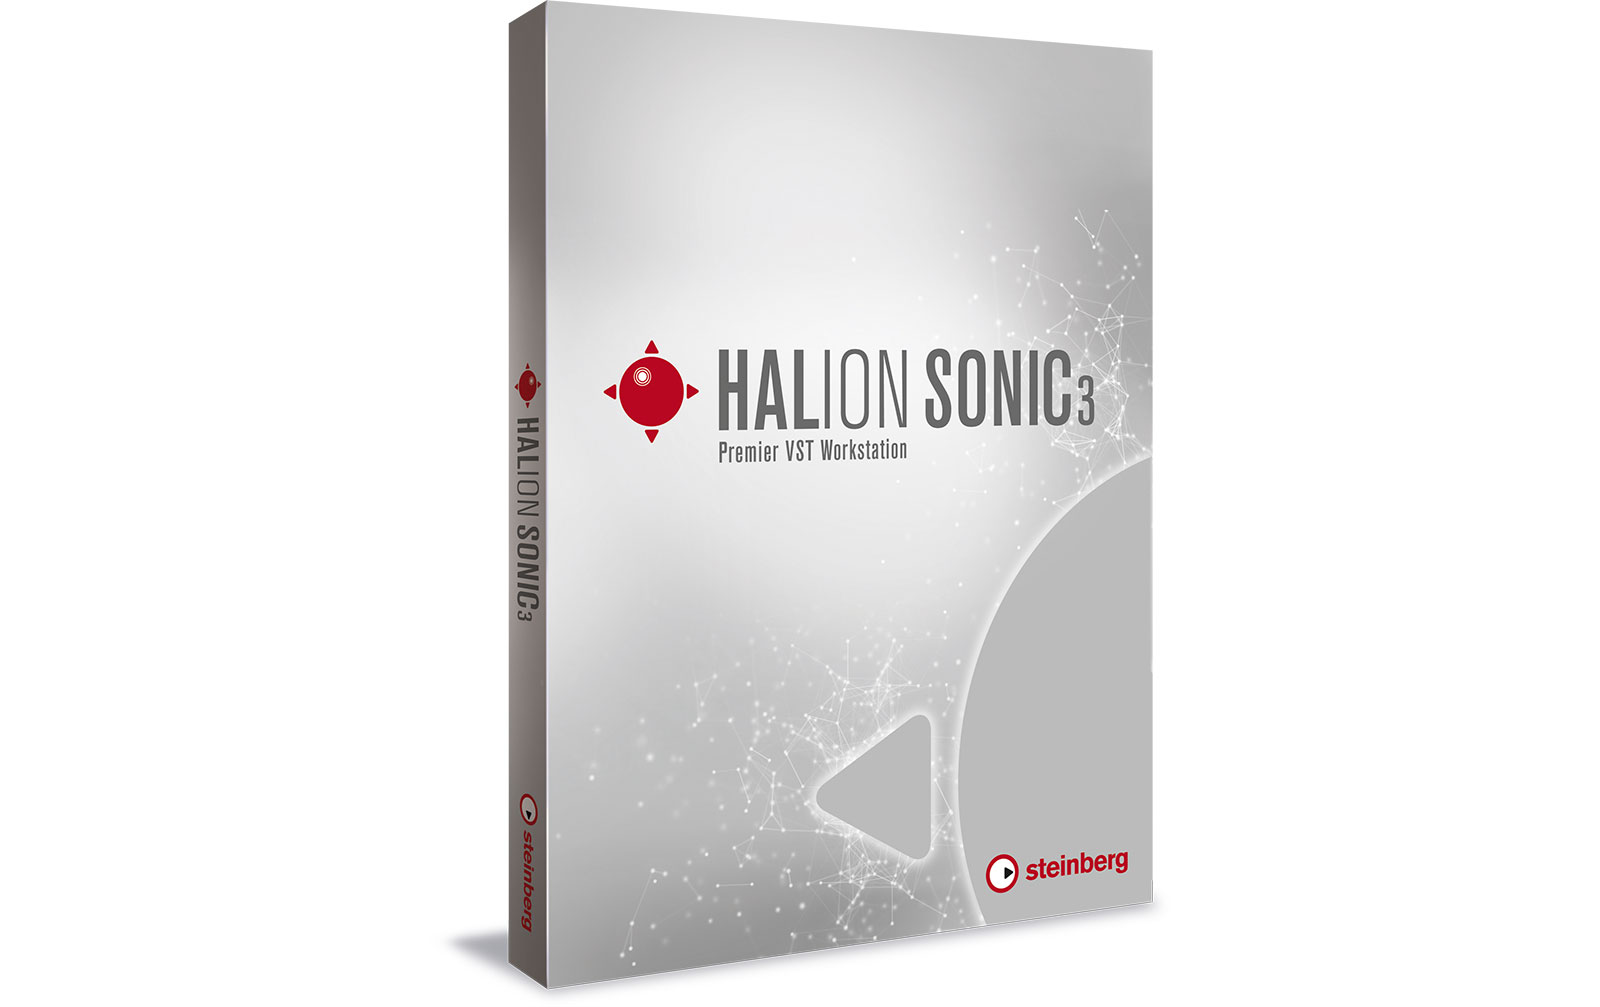 steinberg-halion-sonic-3